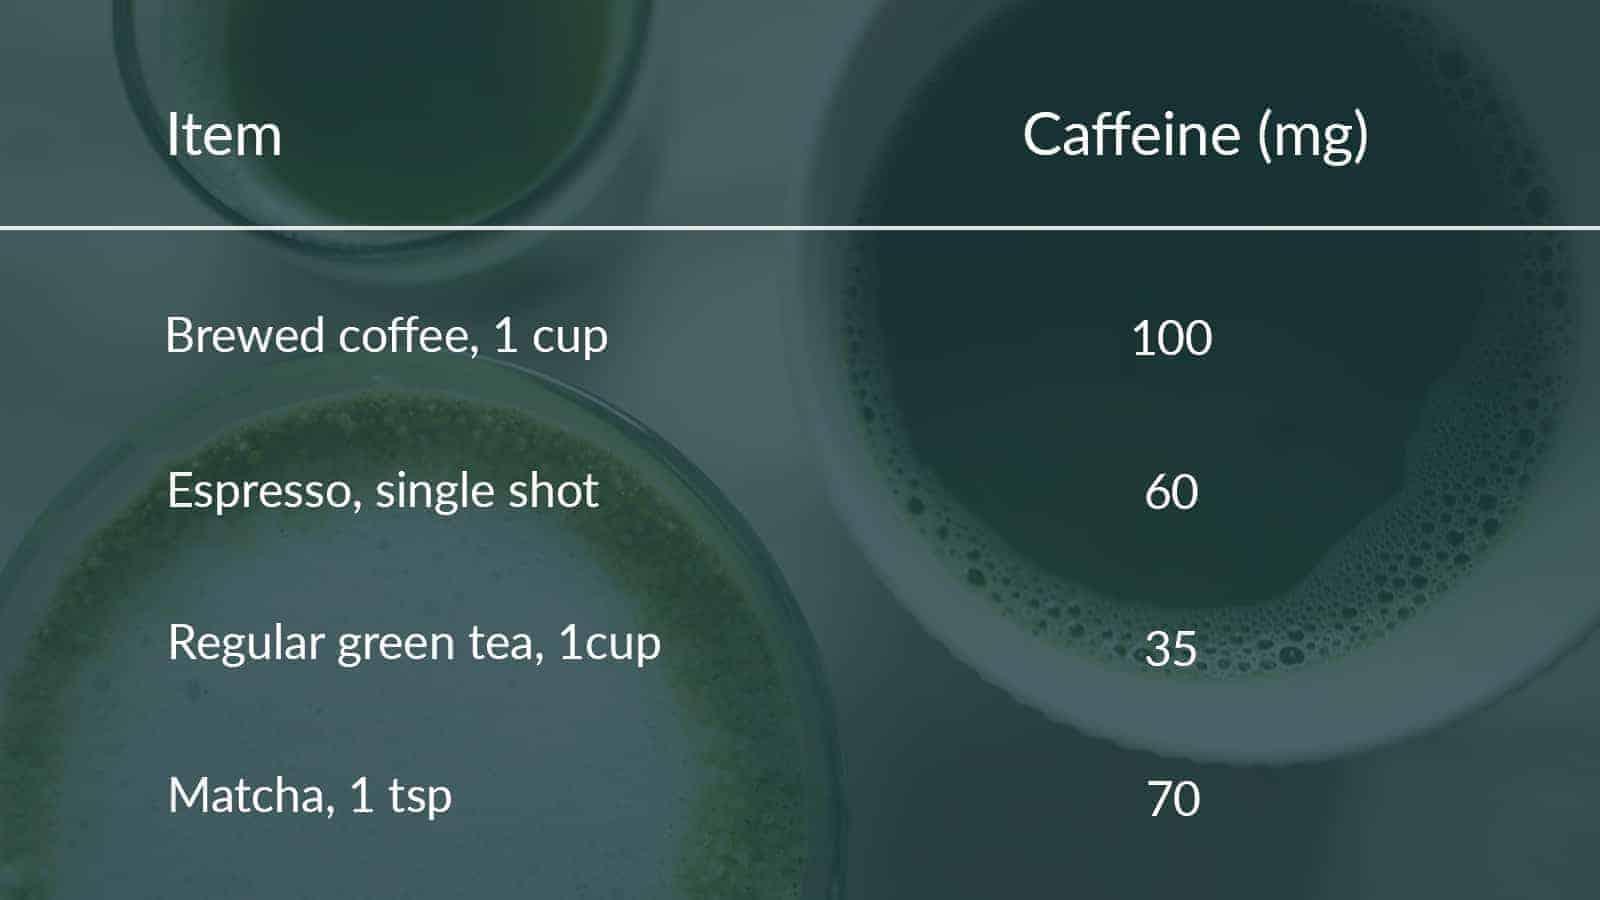 Caffeine content in coffee vs matcha